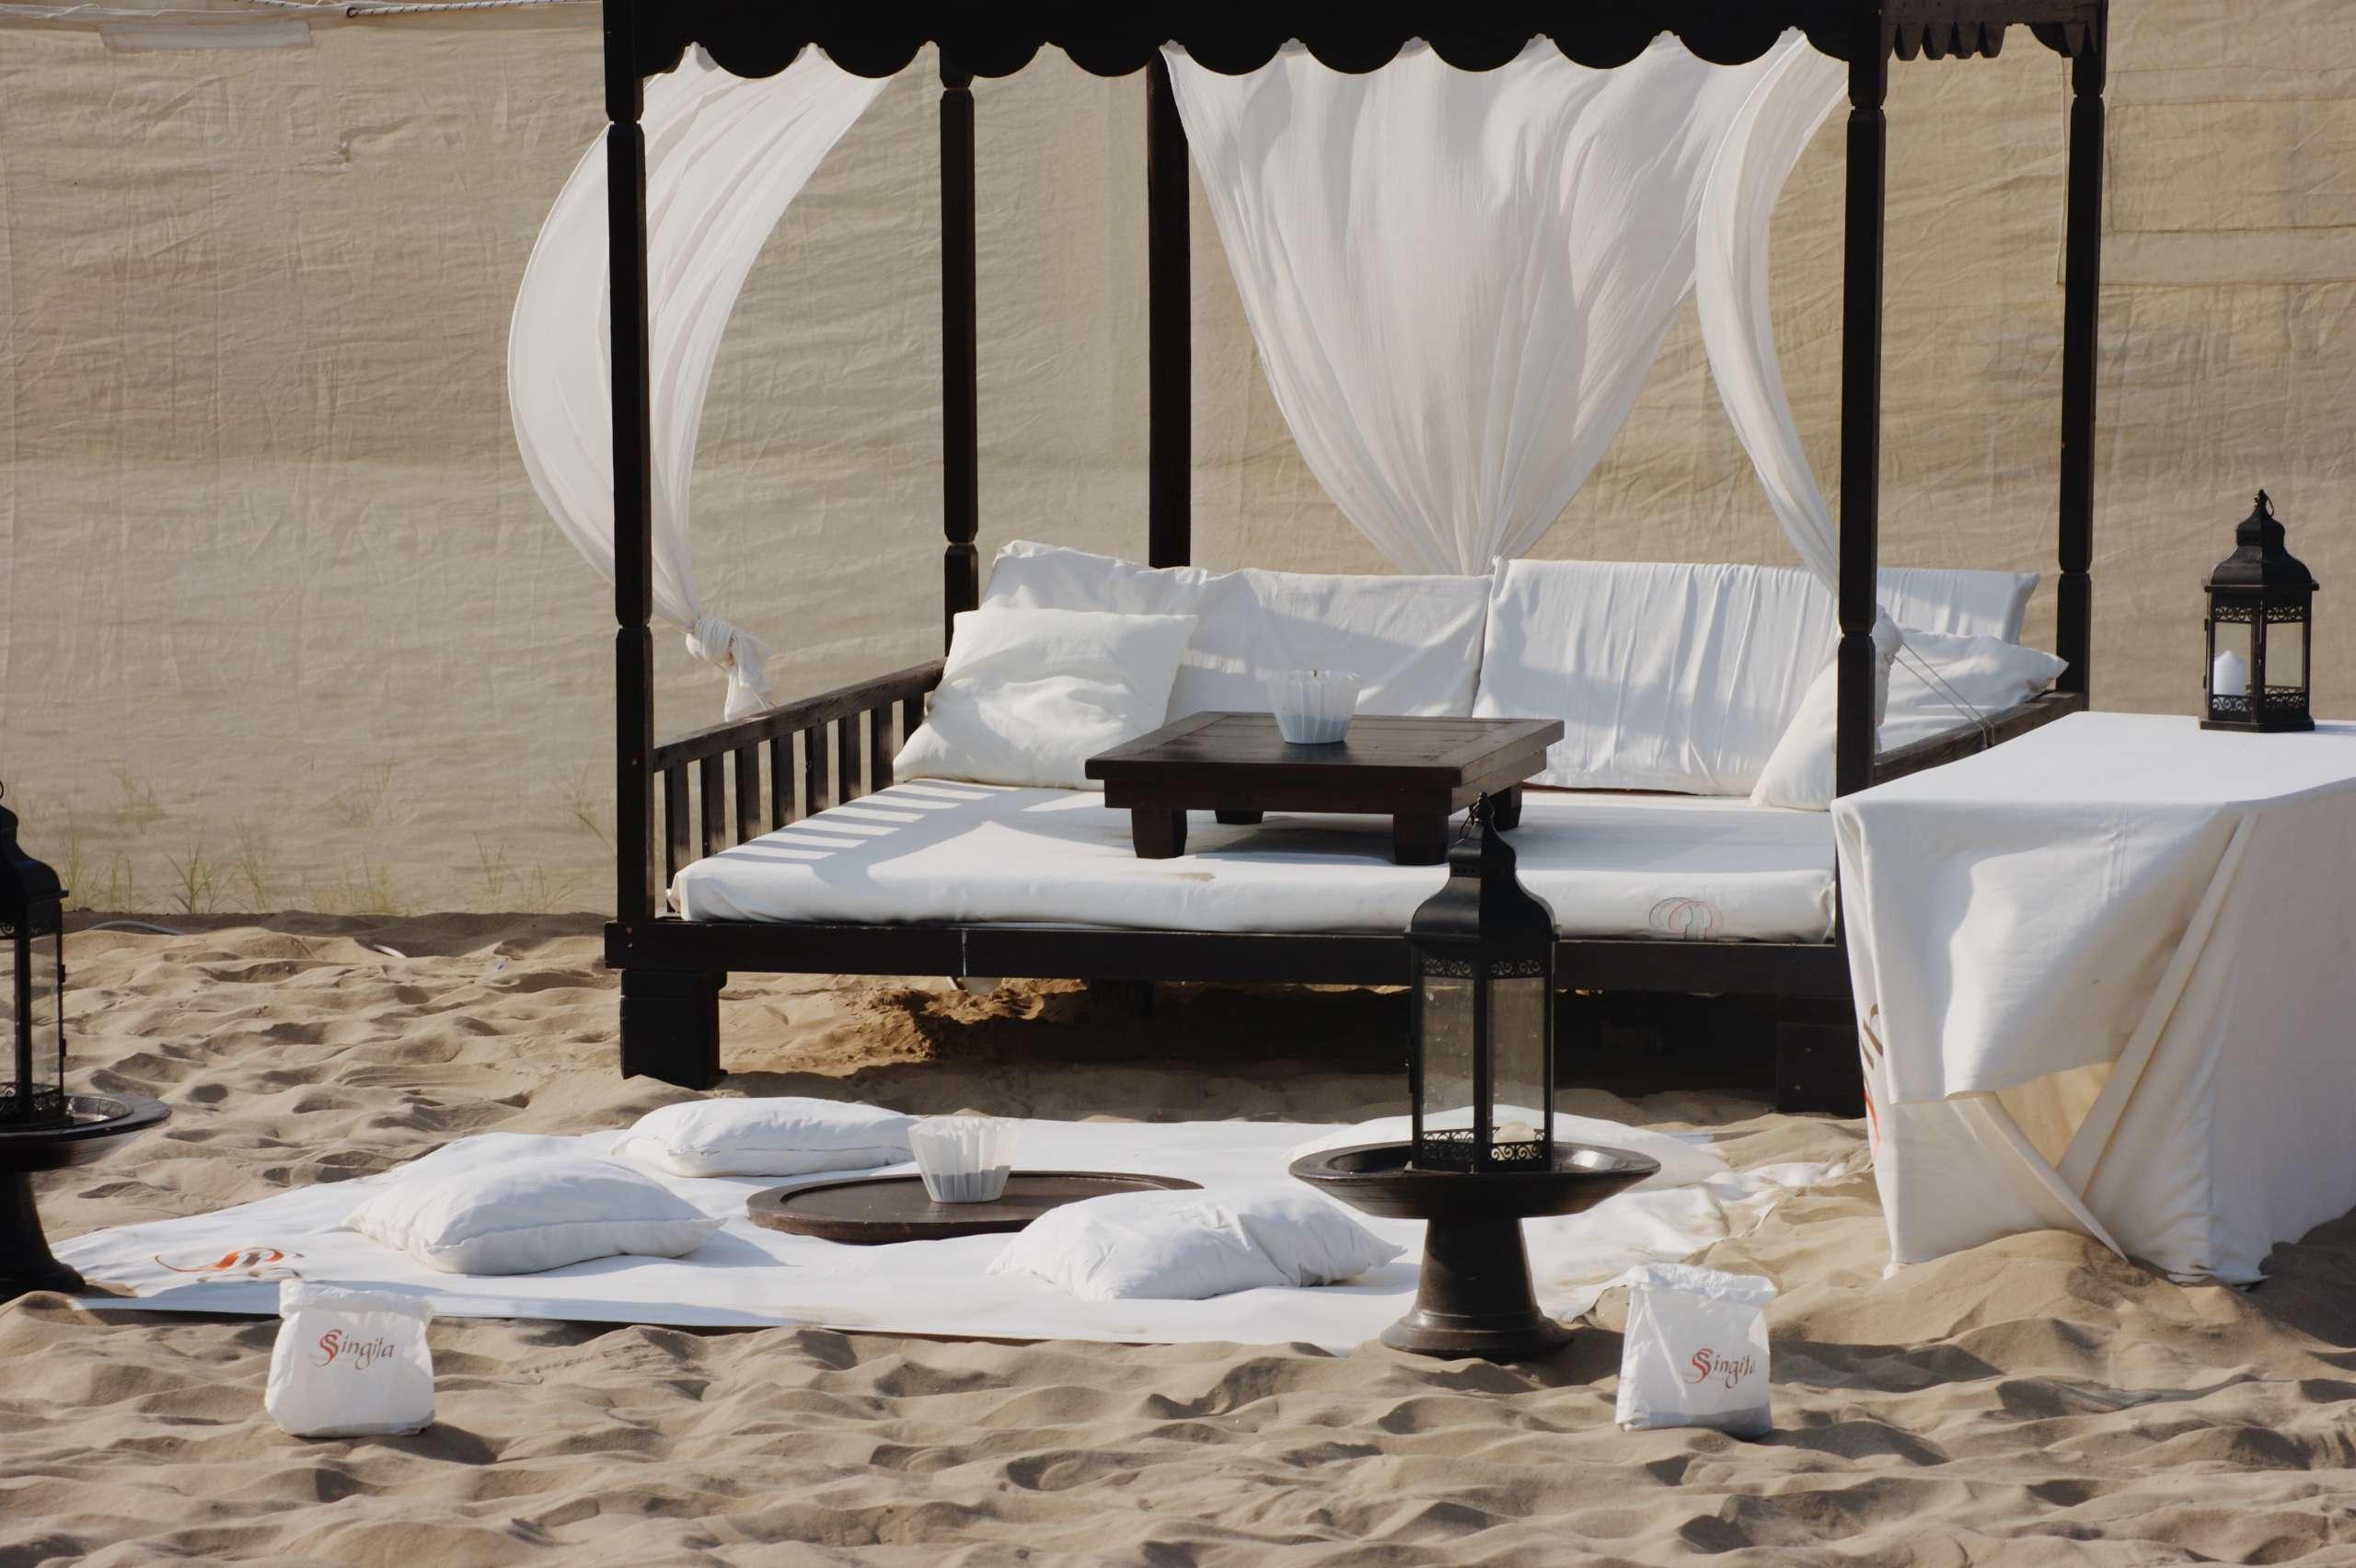 singita-marina-di-ravenna-beach-beach-club-Italy--Mejuri-otterbox-phone-case-summer-rayban-balenciaga-won-hundred